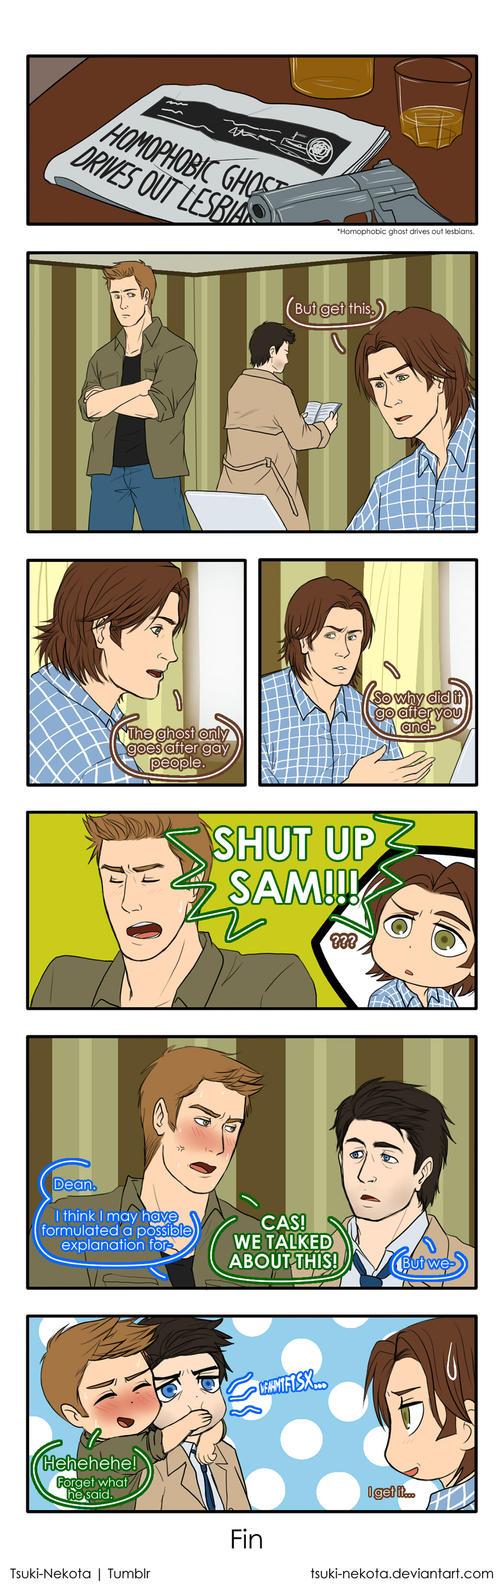 Sammy is confused by Tsuki-Nekota